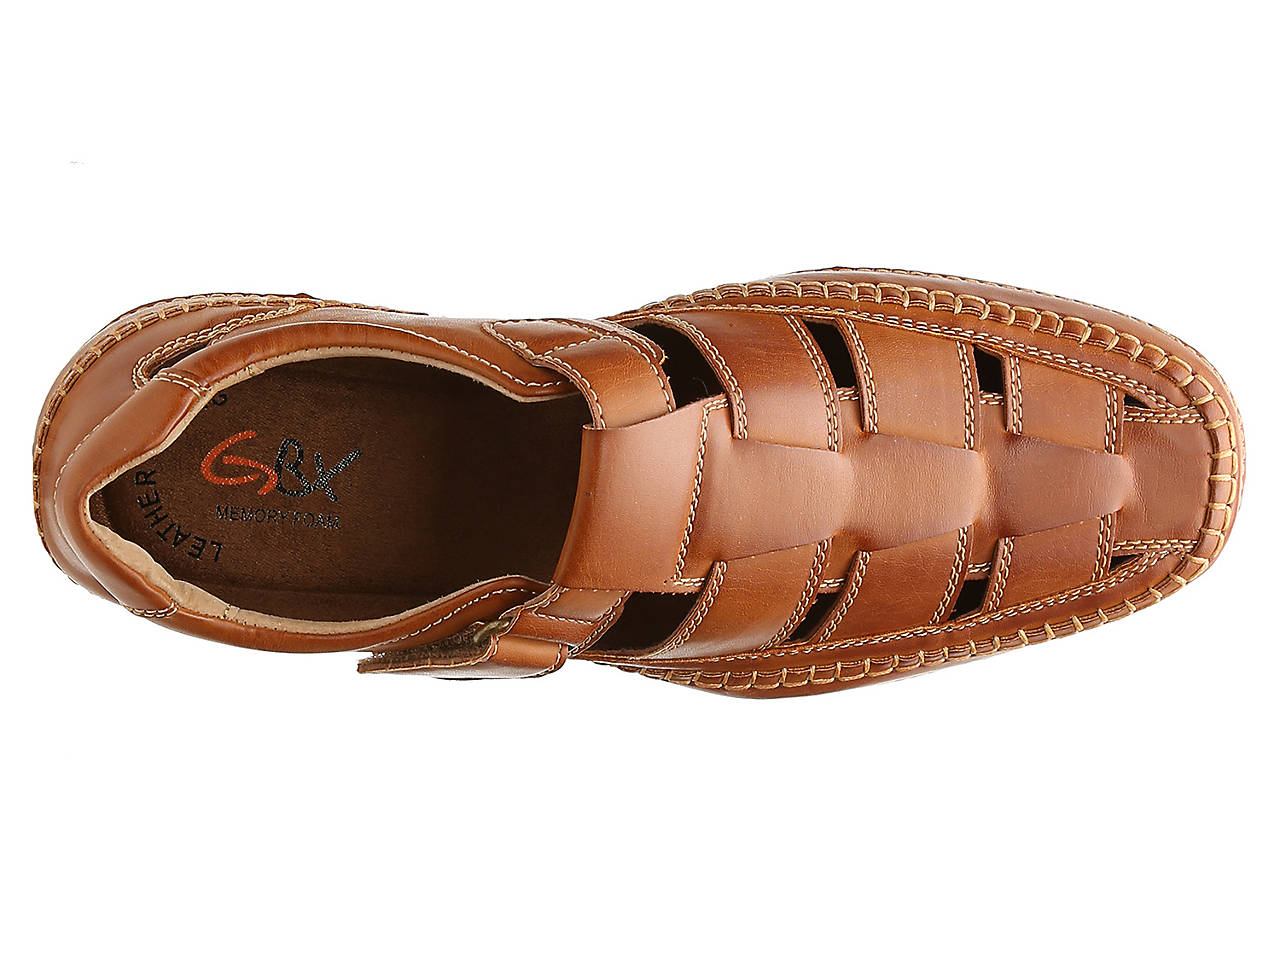 7eaf814e77b GBX Sentaur Fisherman Sandal Men s Shoes